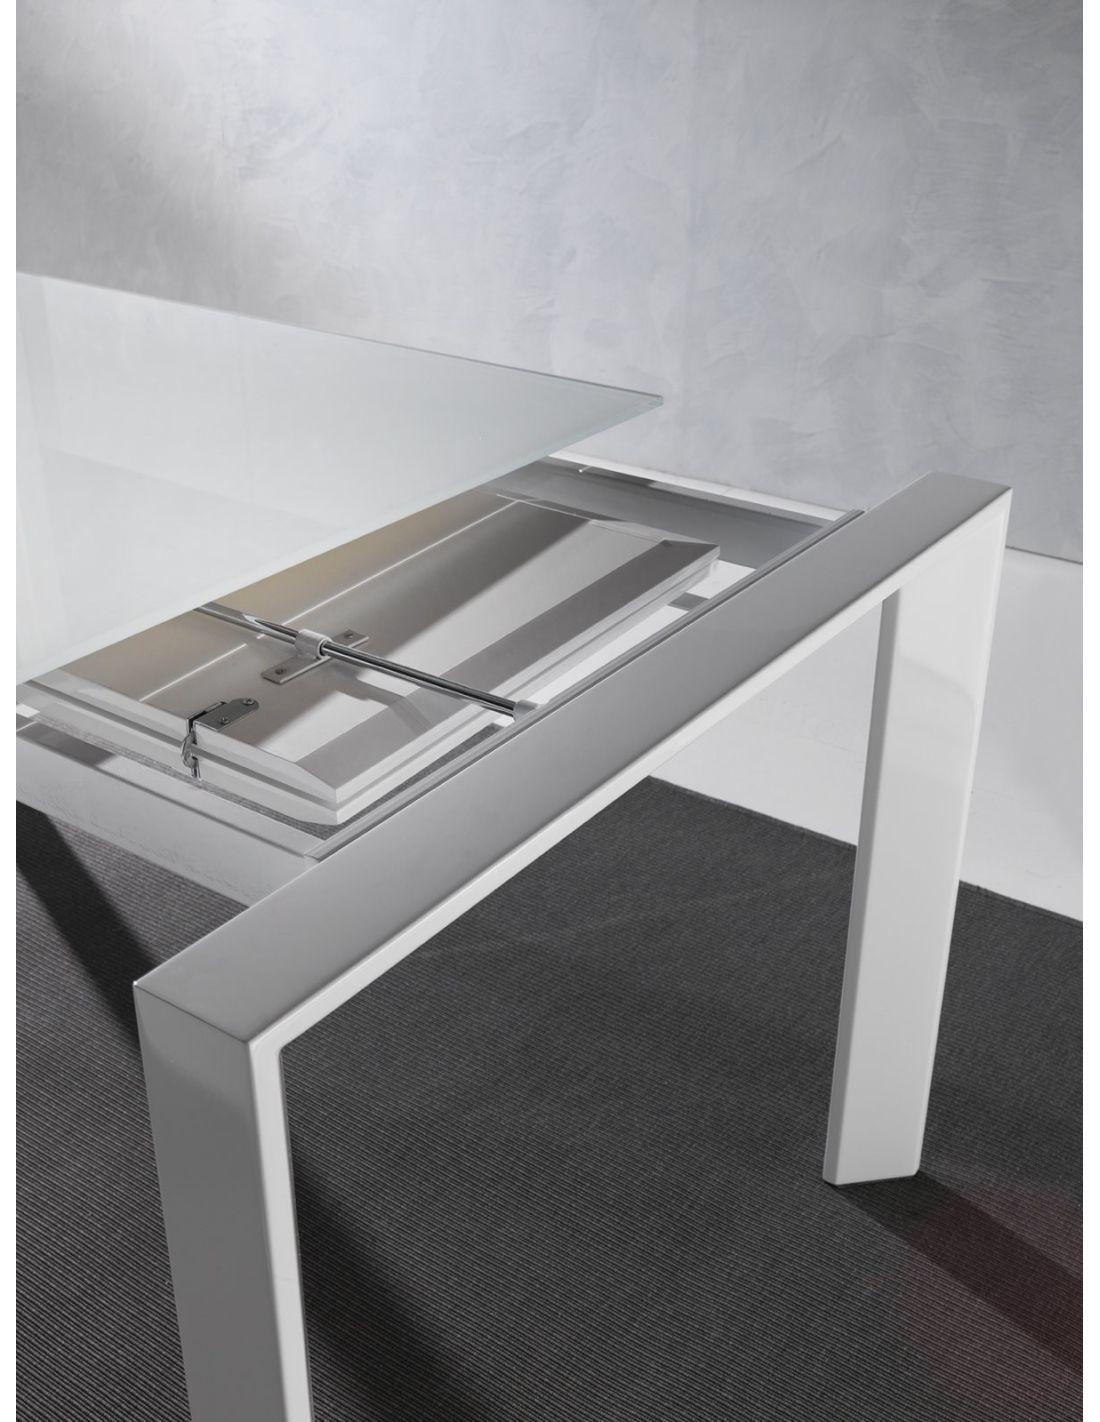 Tavolo in vetro allungabile harvey per cucina o soggiorno 120 x 80 cm - Tavolo di vetro per soggiorno ...